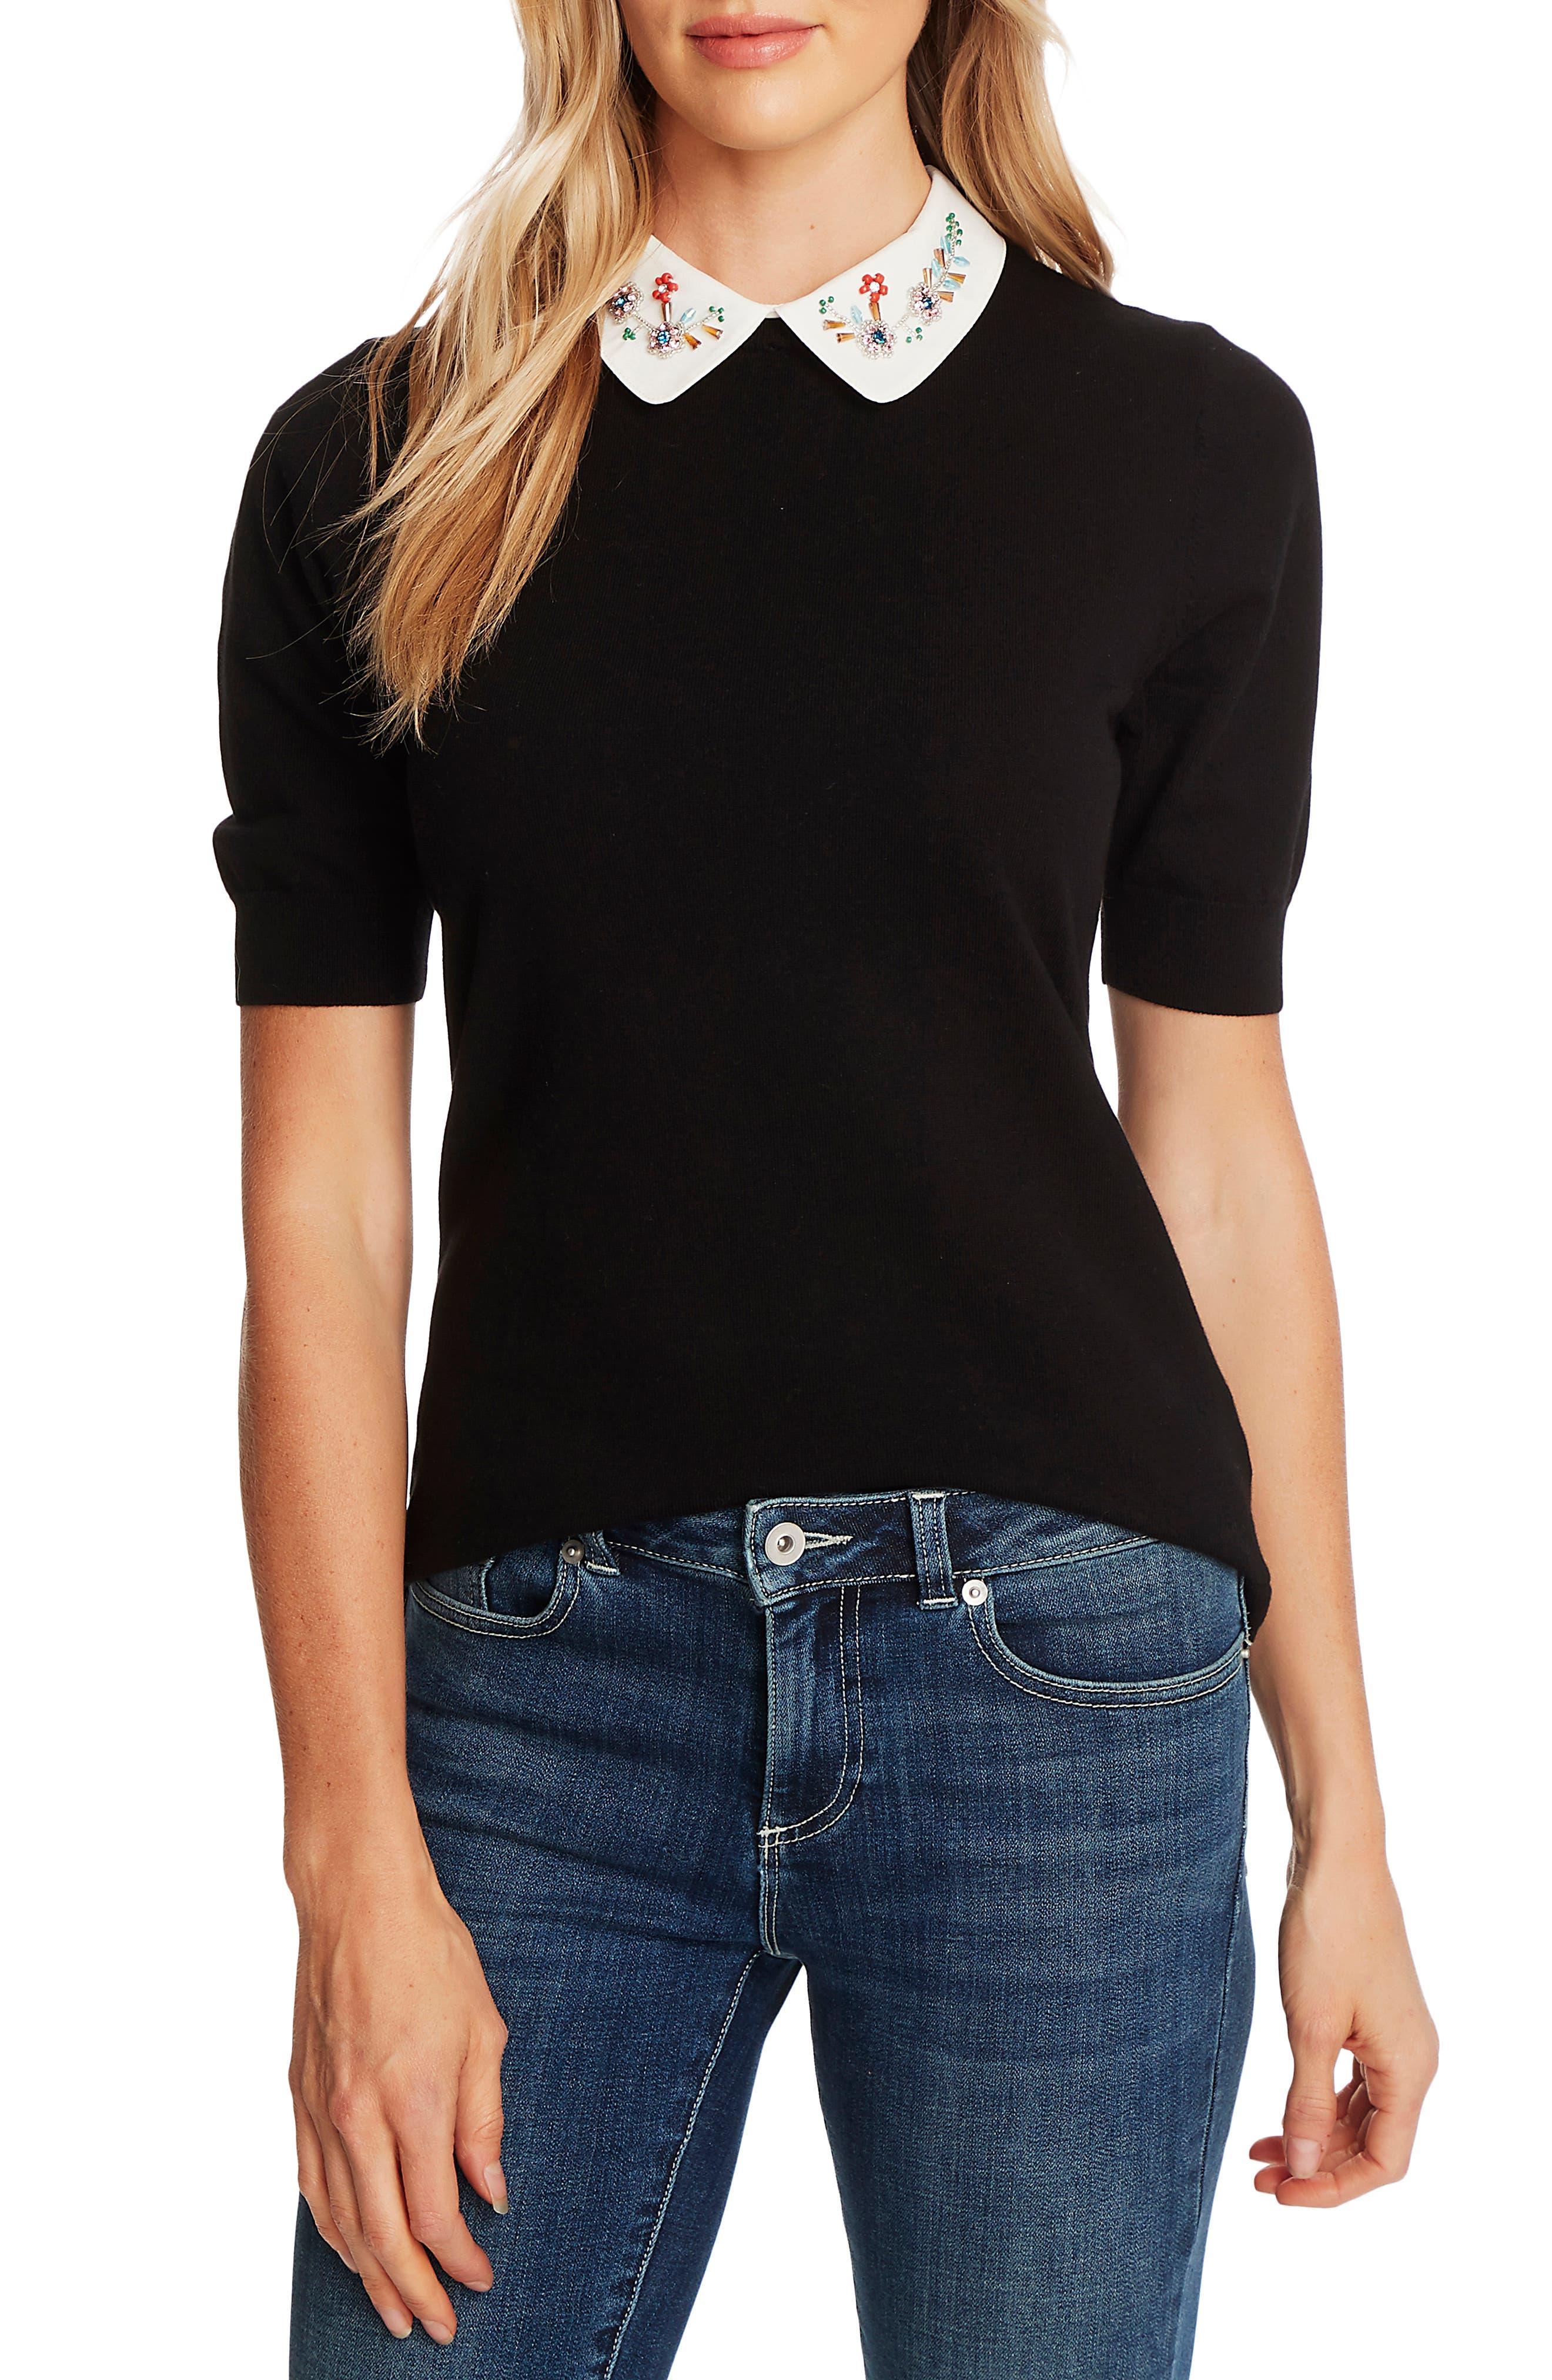 1930s Style Blouses, Shirts, Tops | Vintage Blouses Womens Cece Embellished Collar Short Sleeve Sweater $53.40 AT vintagedancer.com